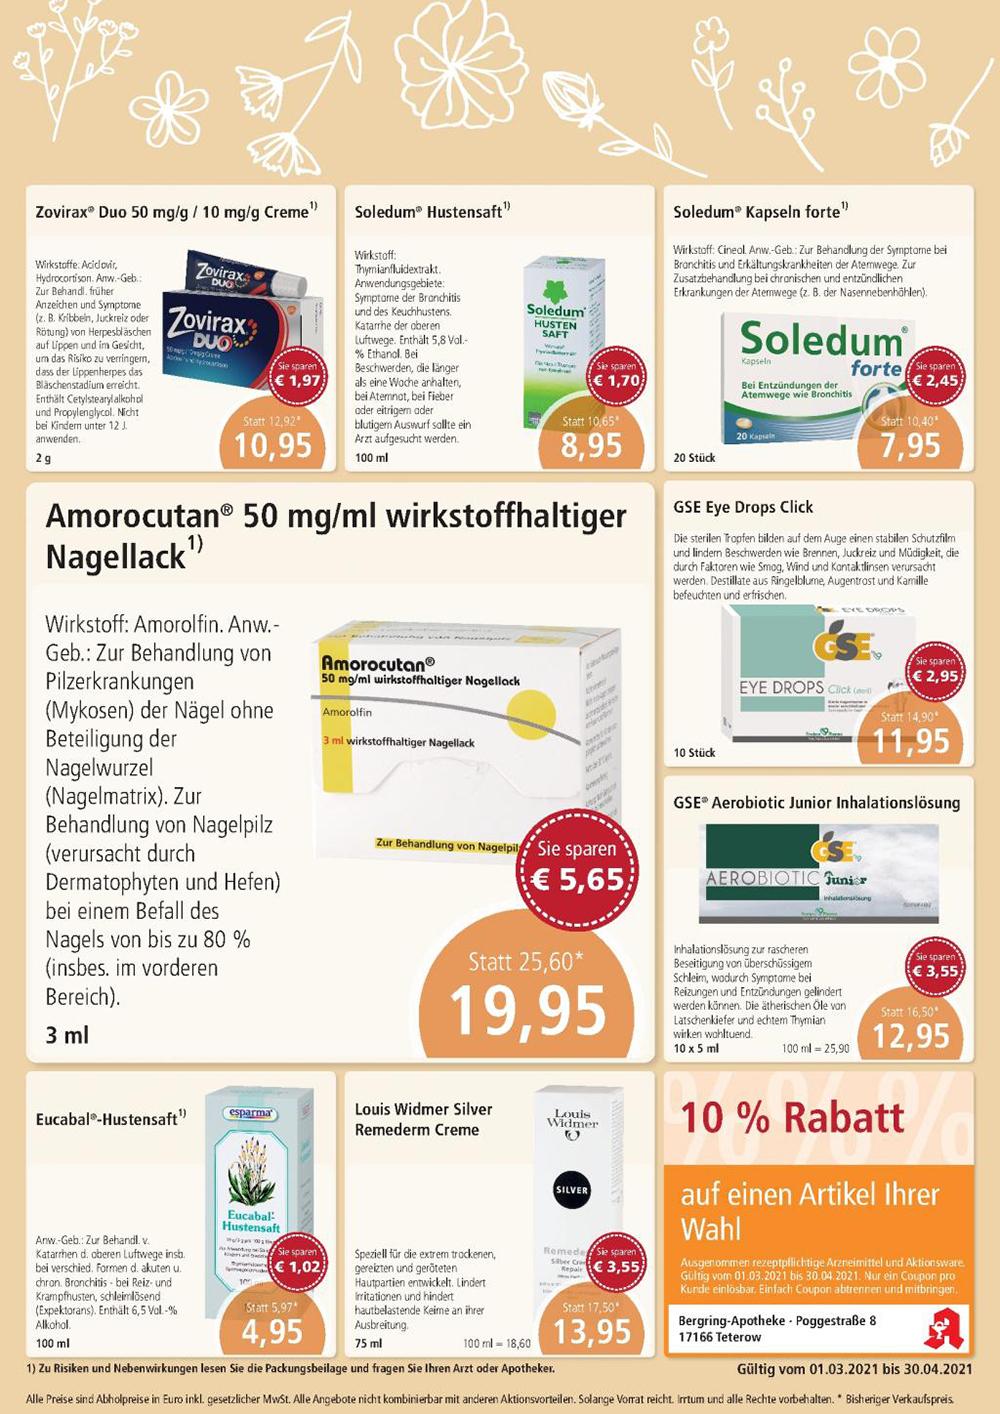 Aktuelle Angebote   Bergring-Apotheke in 17166 Teterow